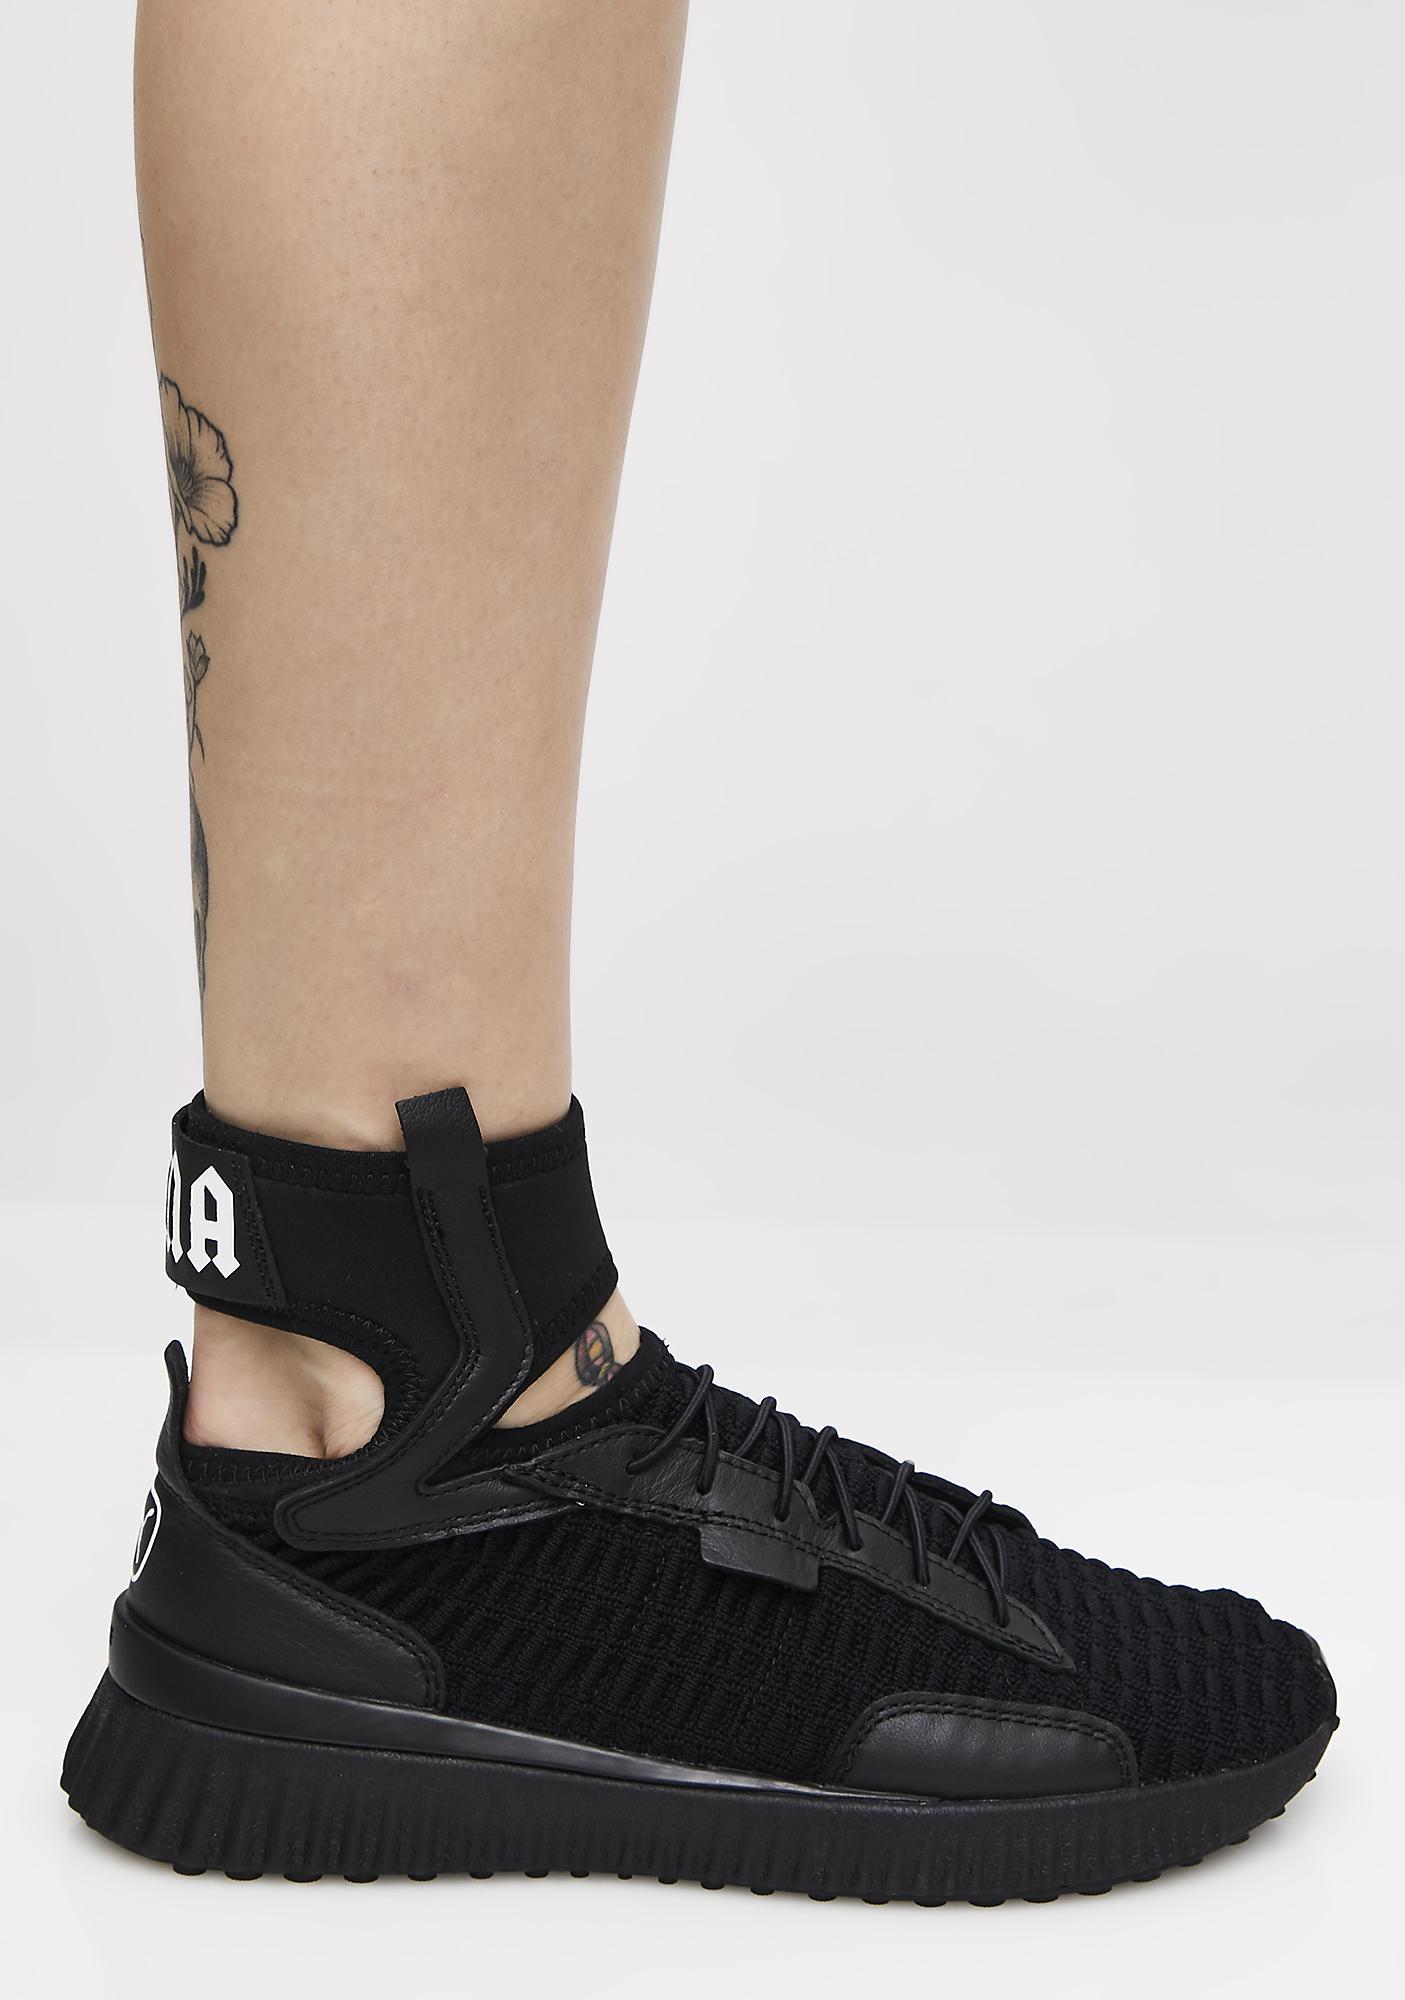 rihanna puma fenty sneakers